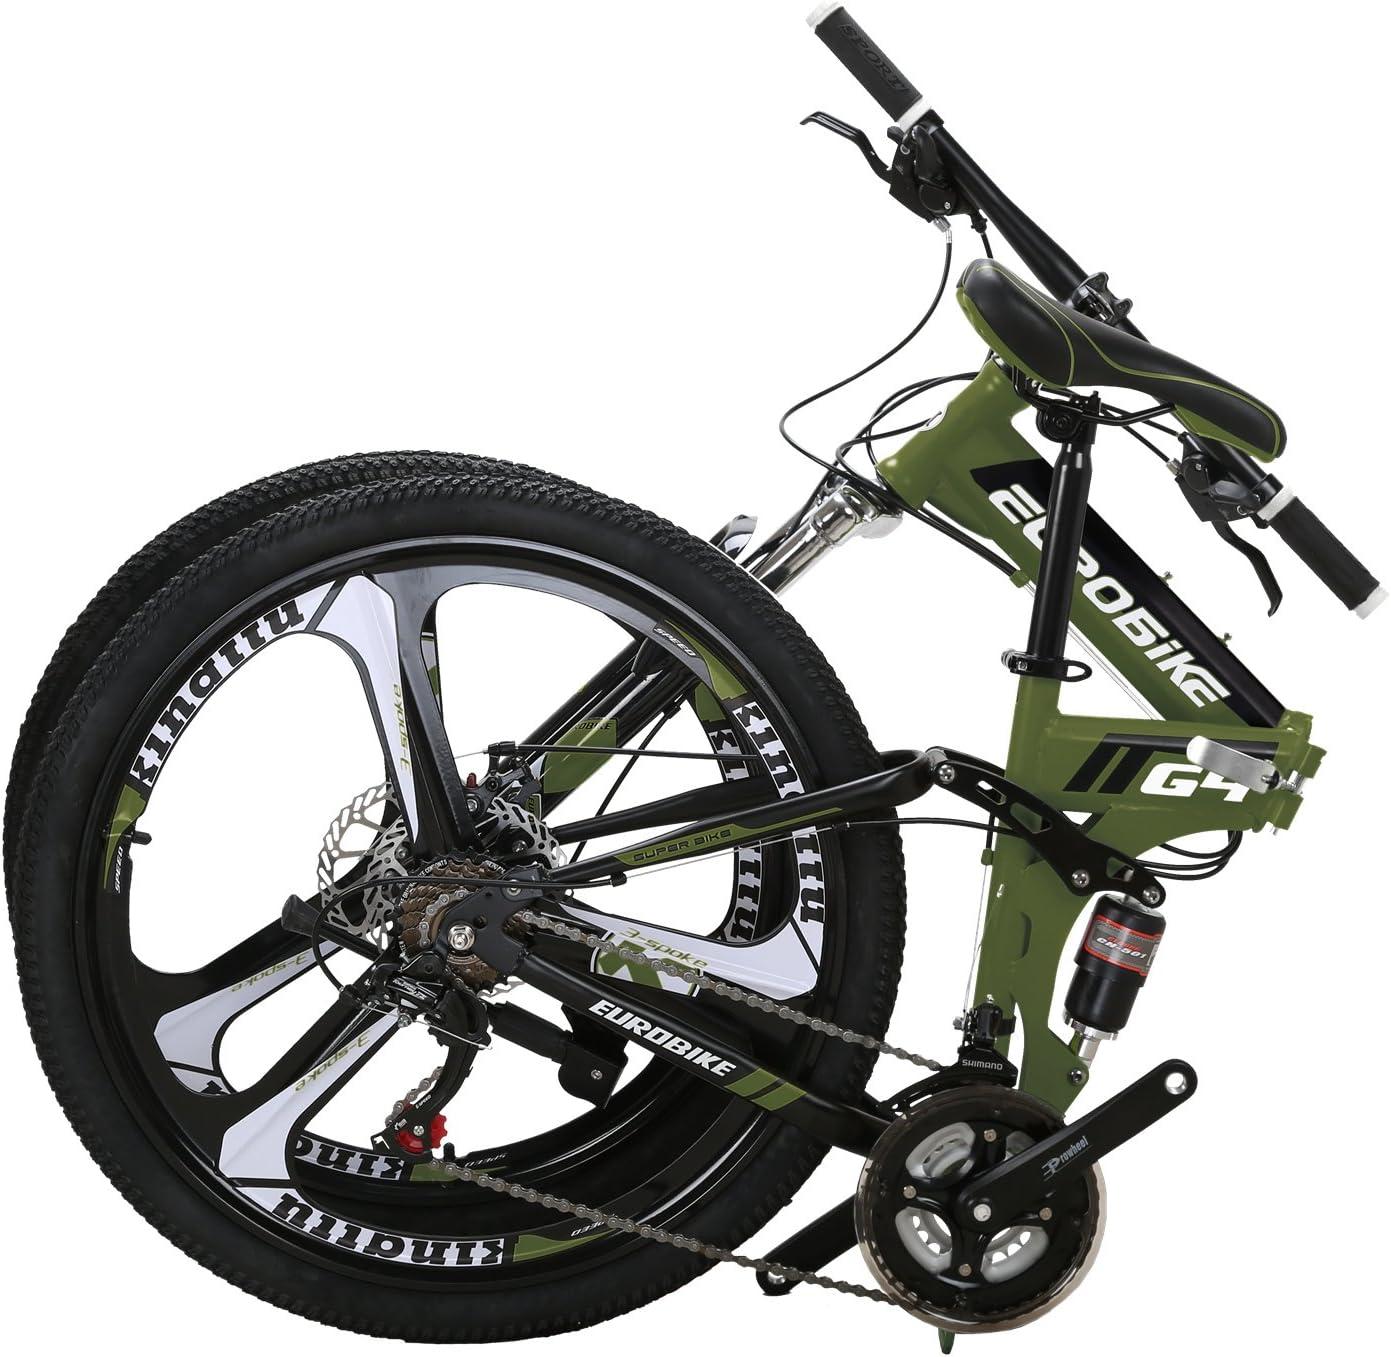 Amazon Com Eurobike Eurg4 Mountain Bike 26 Inches 3 Spoke Dual Suspension Folding Bike 21 Speed Mtb Army Green Sports Outdoors